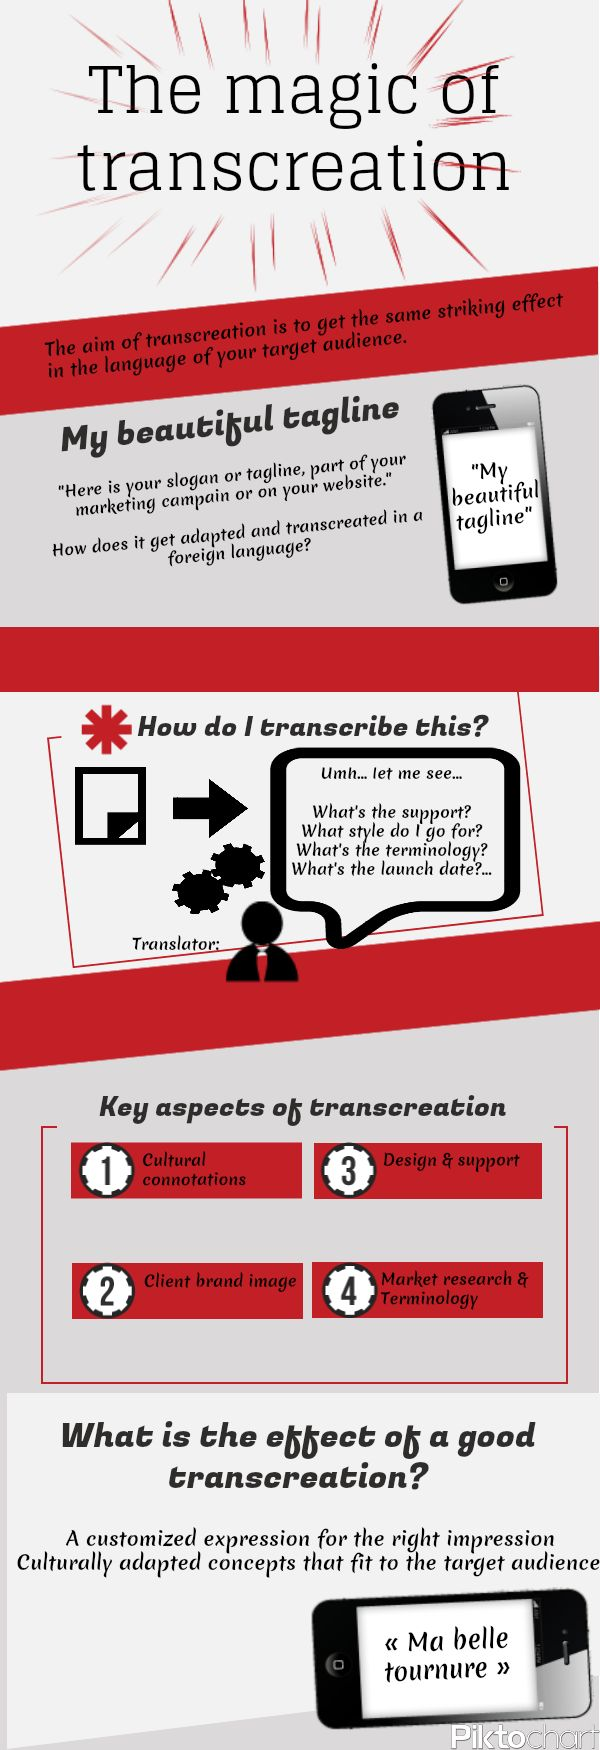 The magic of Transcreation